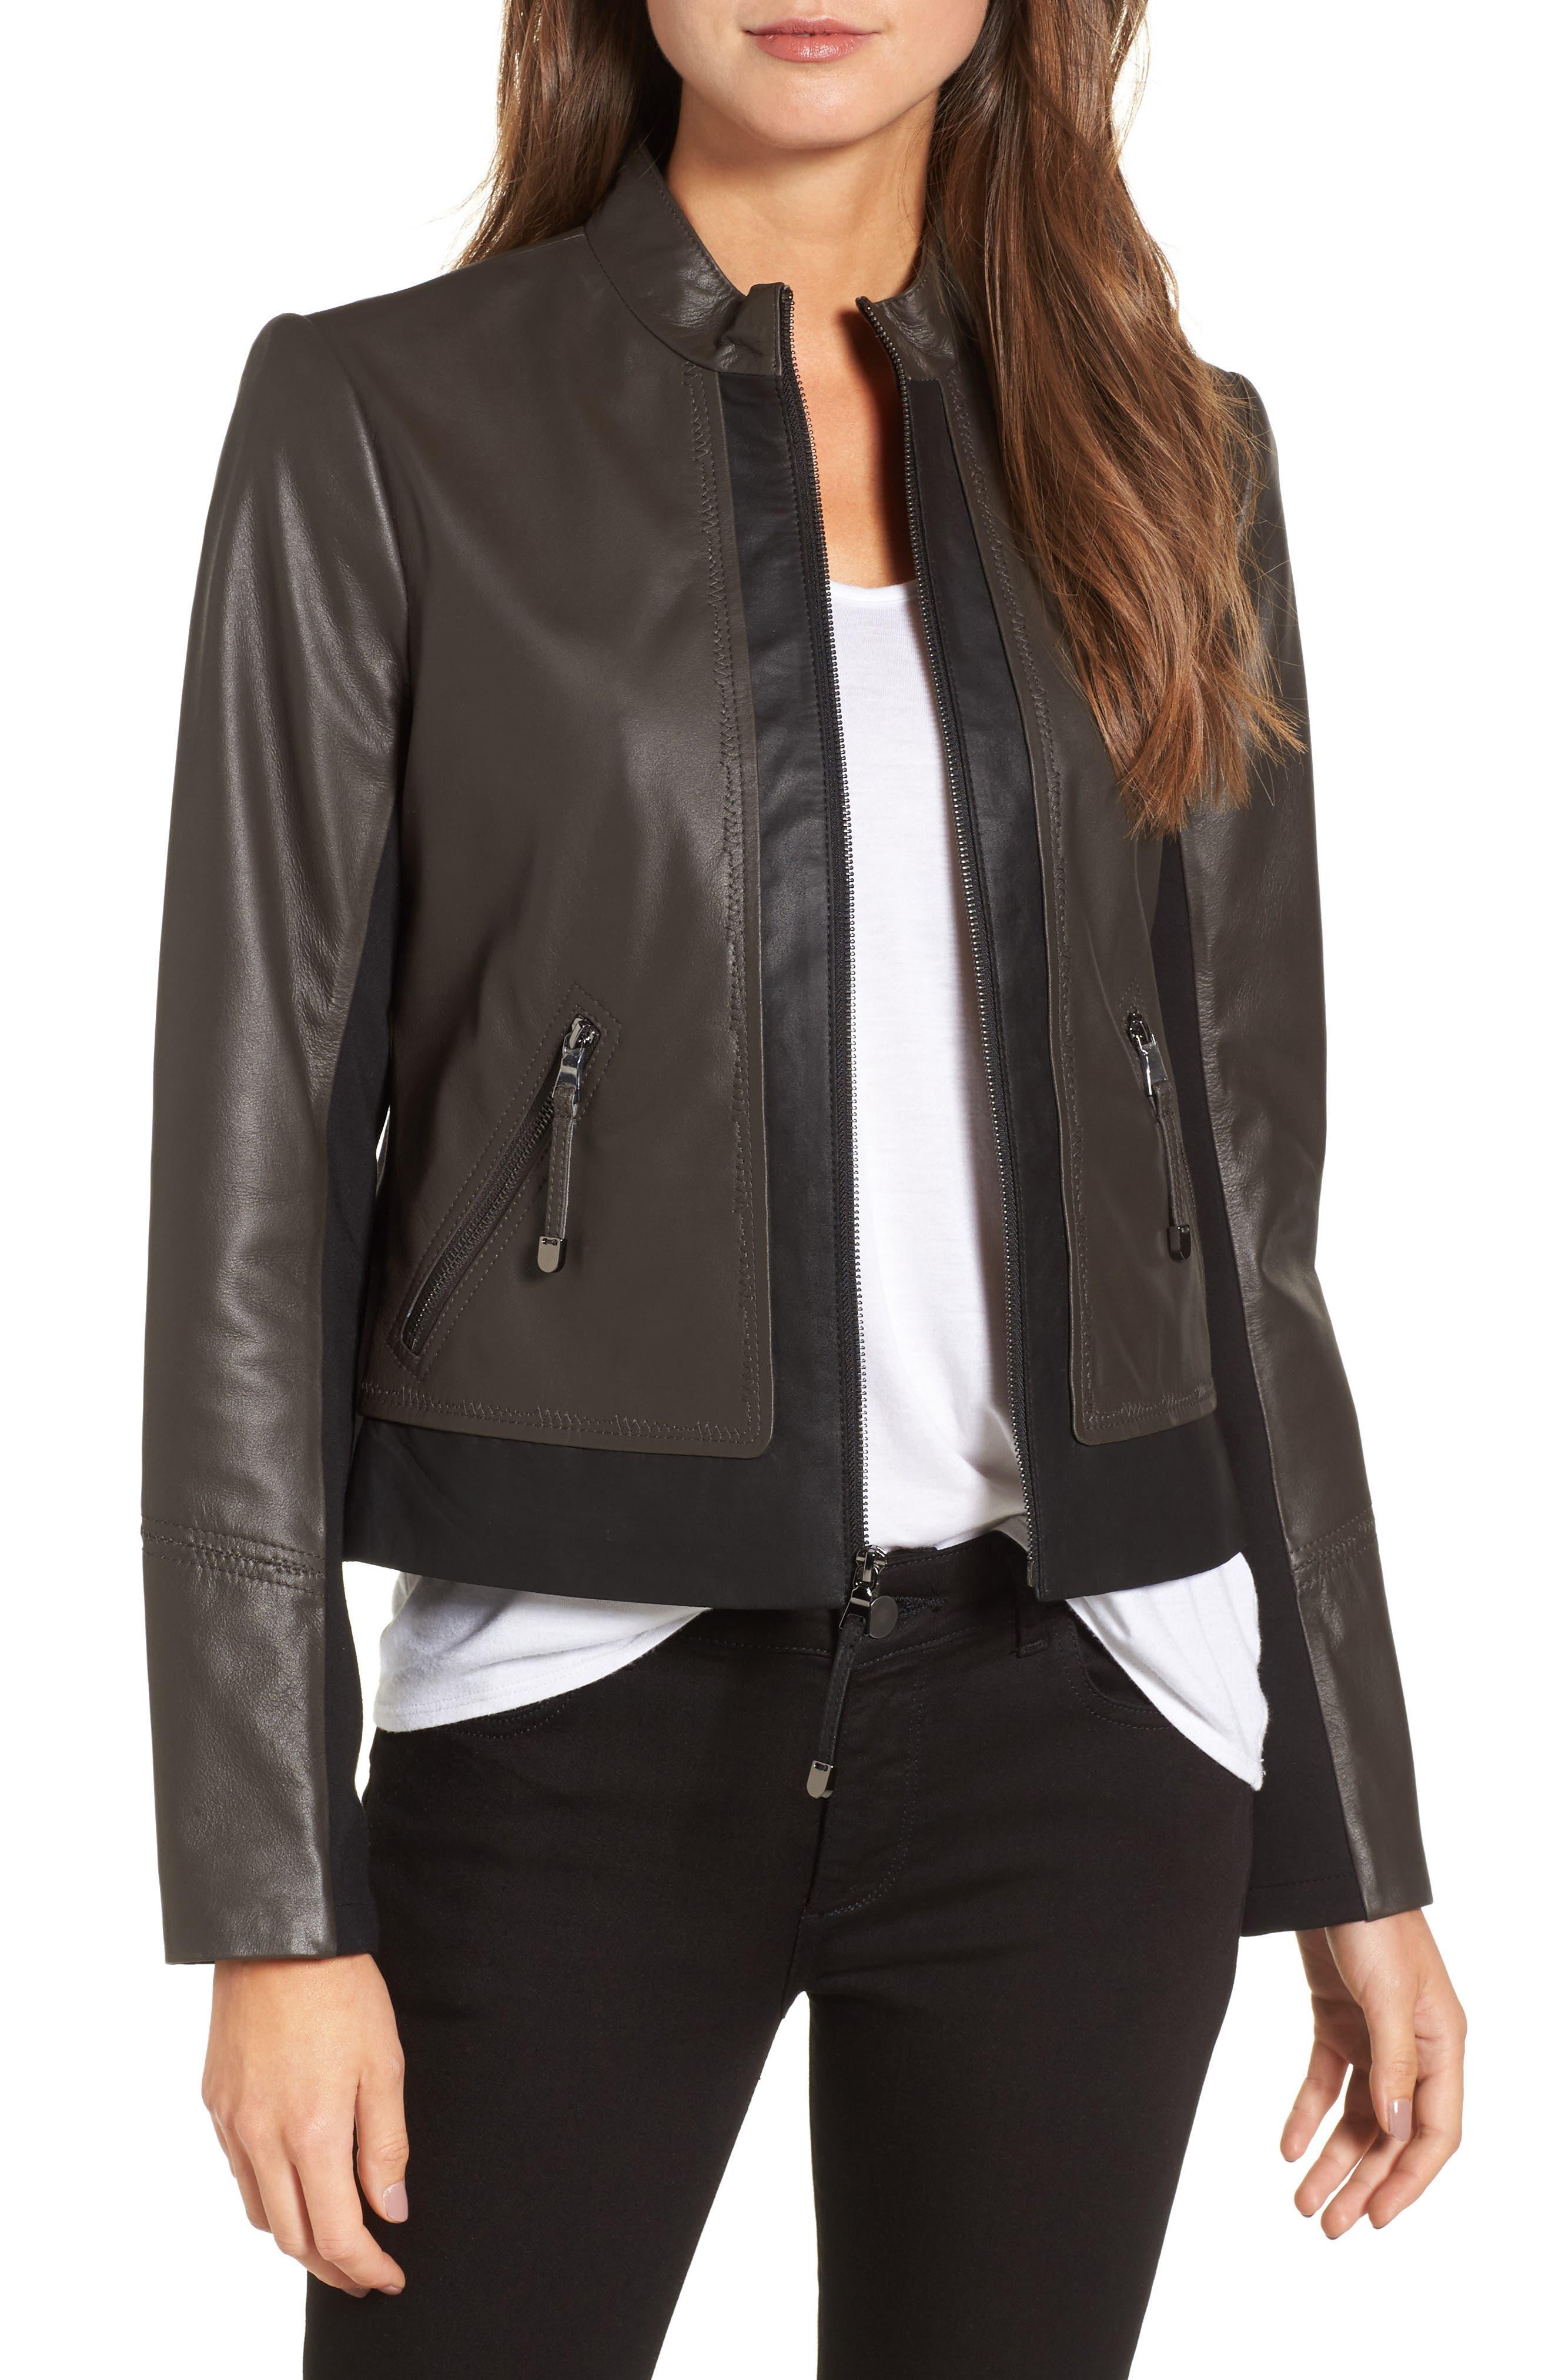 Alternate Image 1 Selected - Via Spiga Colorblock Leather Jacket